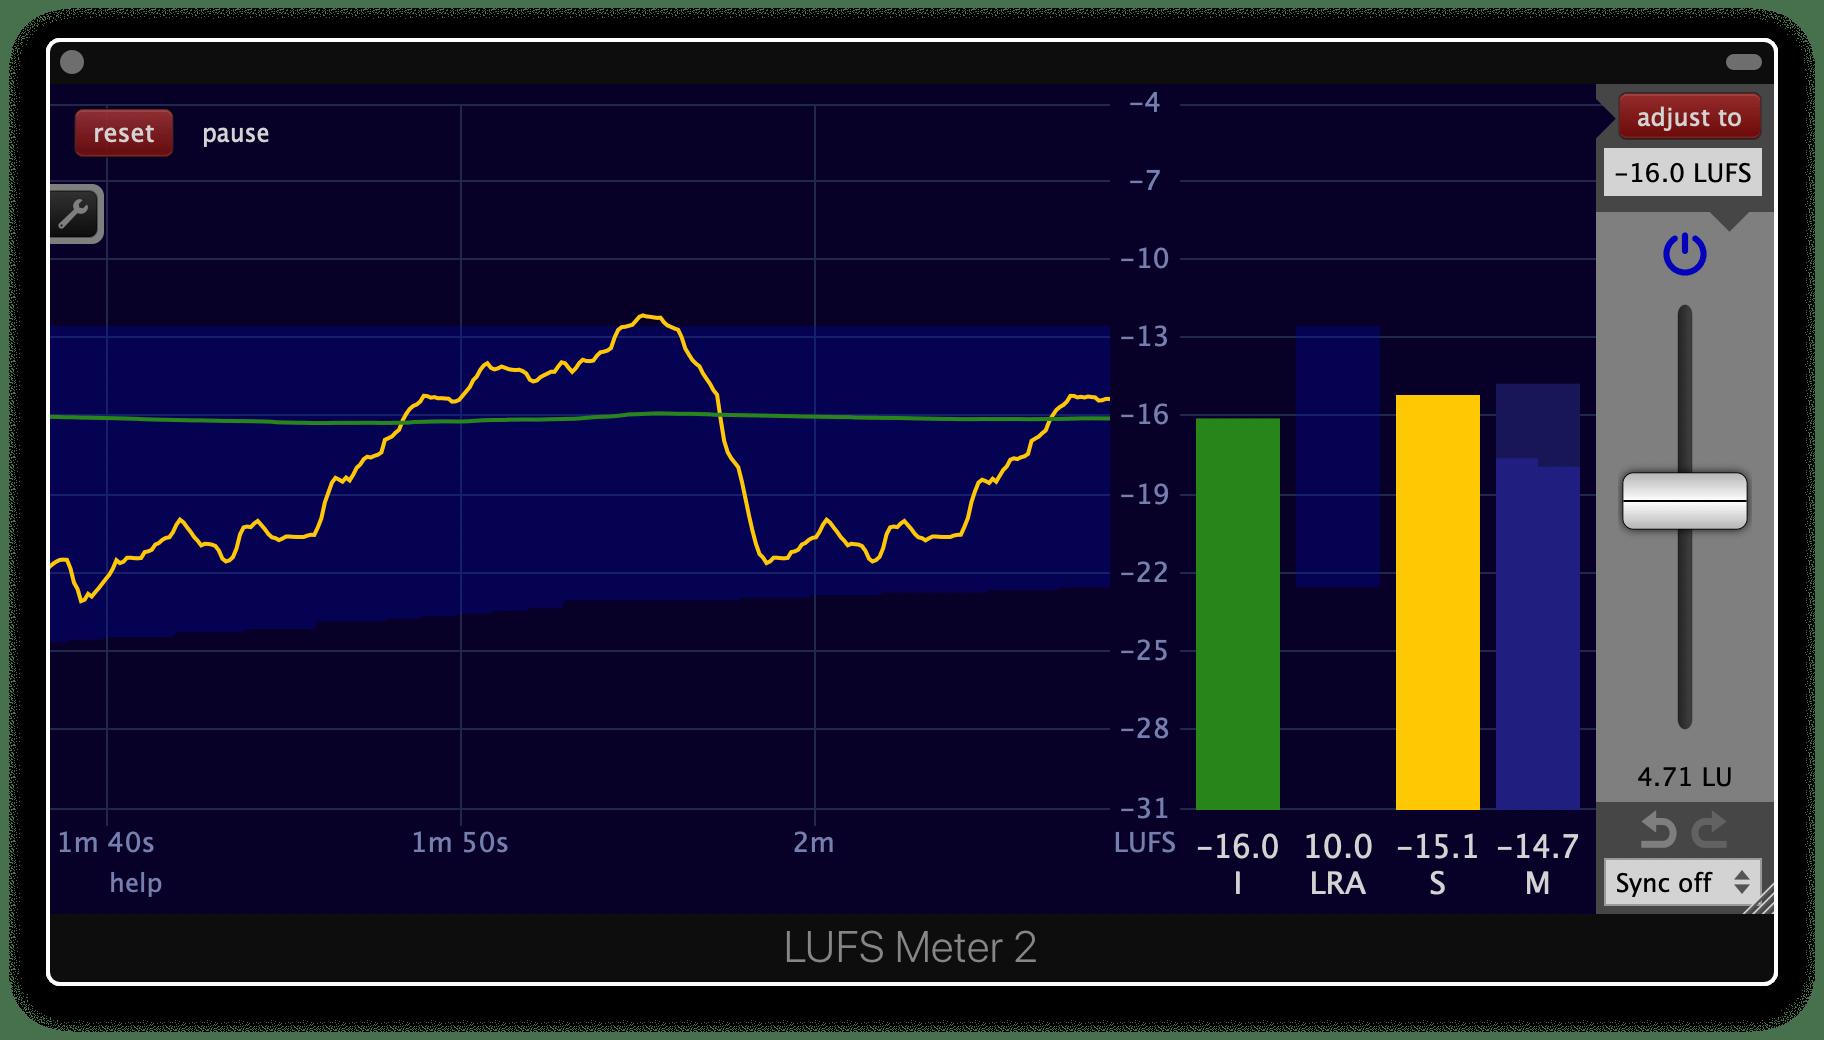 Discounted LUFS Meter